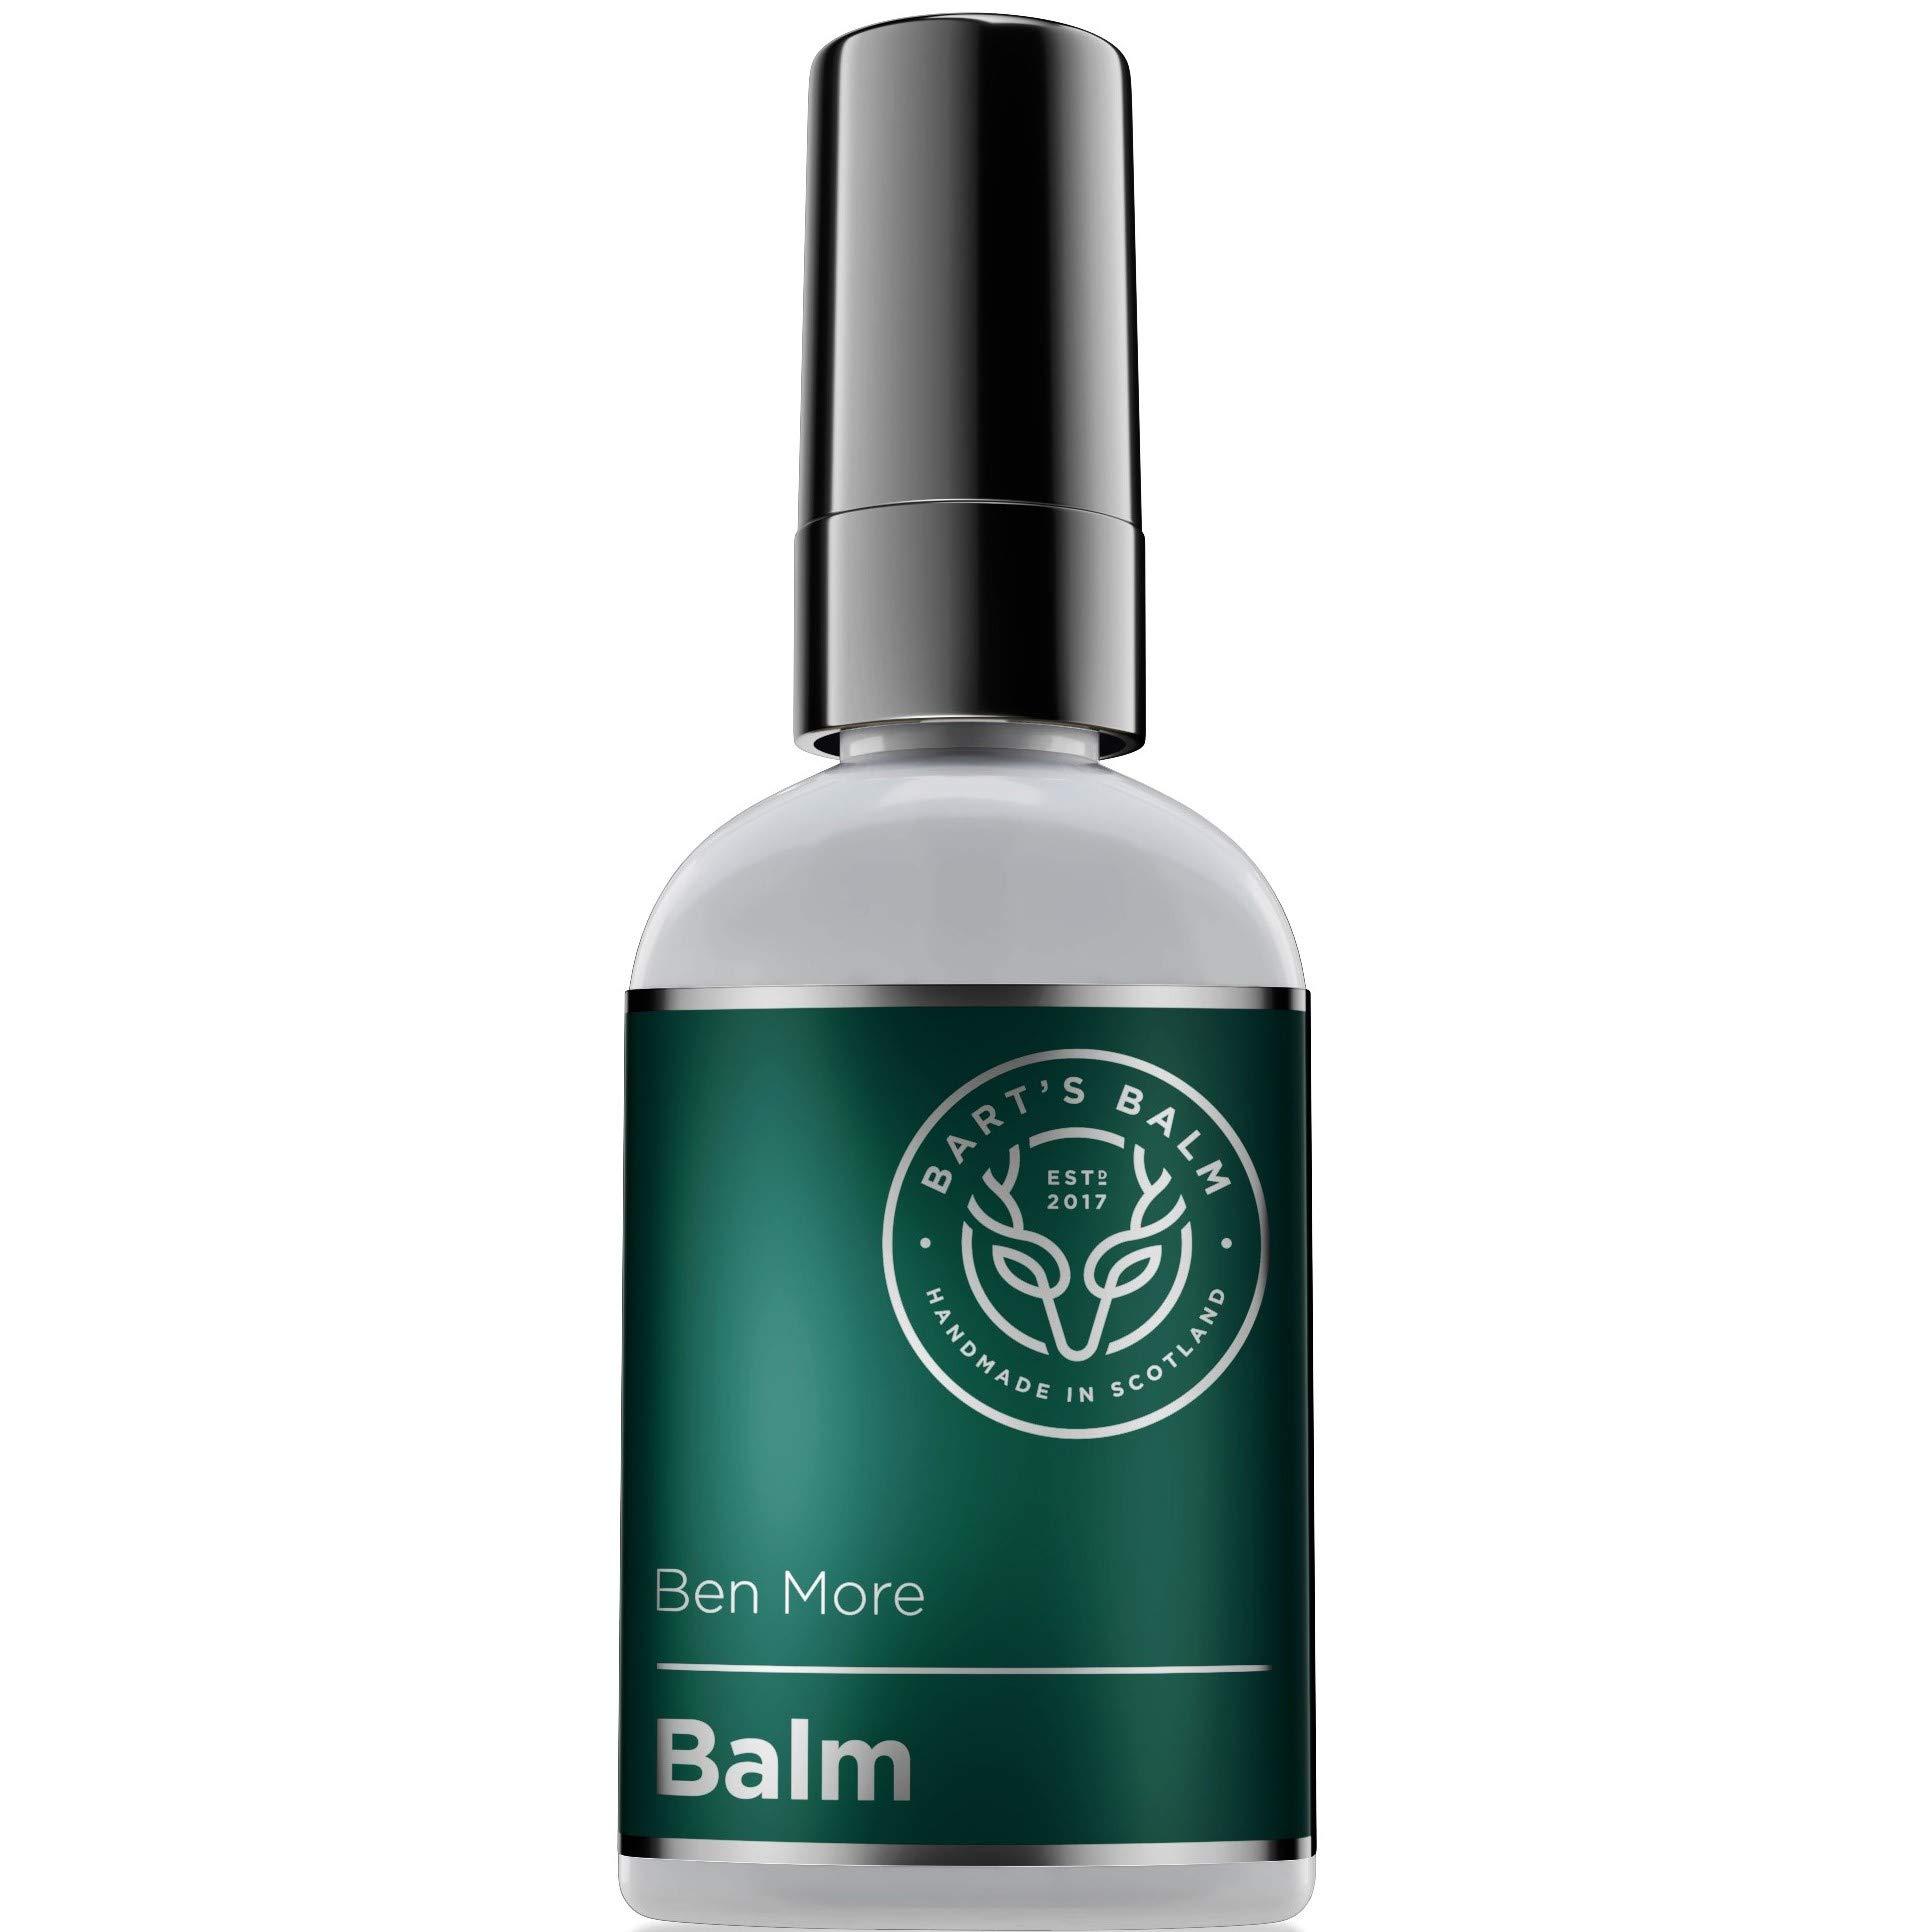 Bart's Balm Men Aftershave Balm - Argan Oil – Bergamot Oil 50ml - Sensitive Post Shave Balm Men